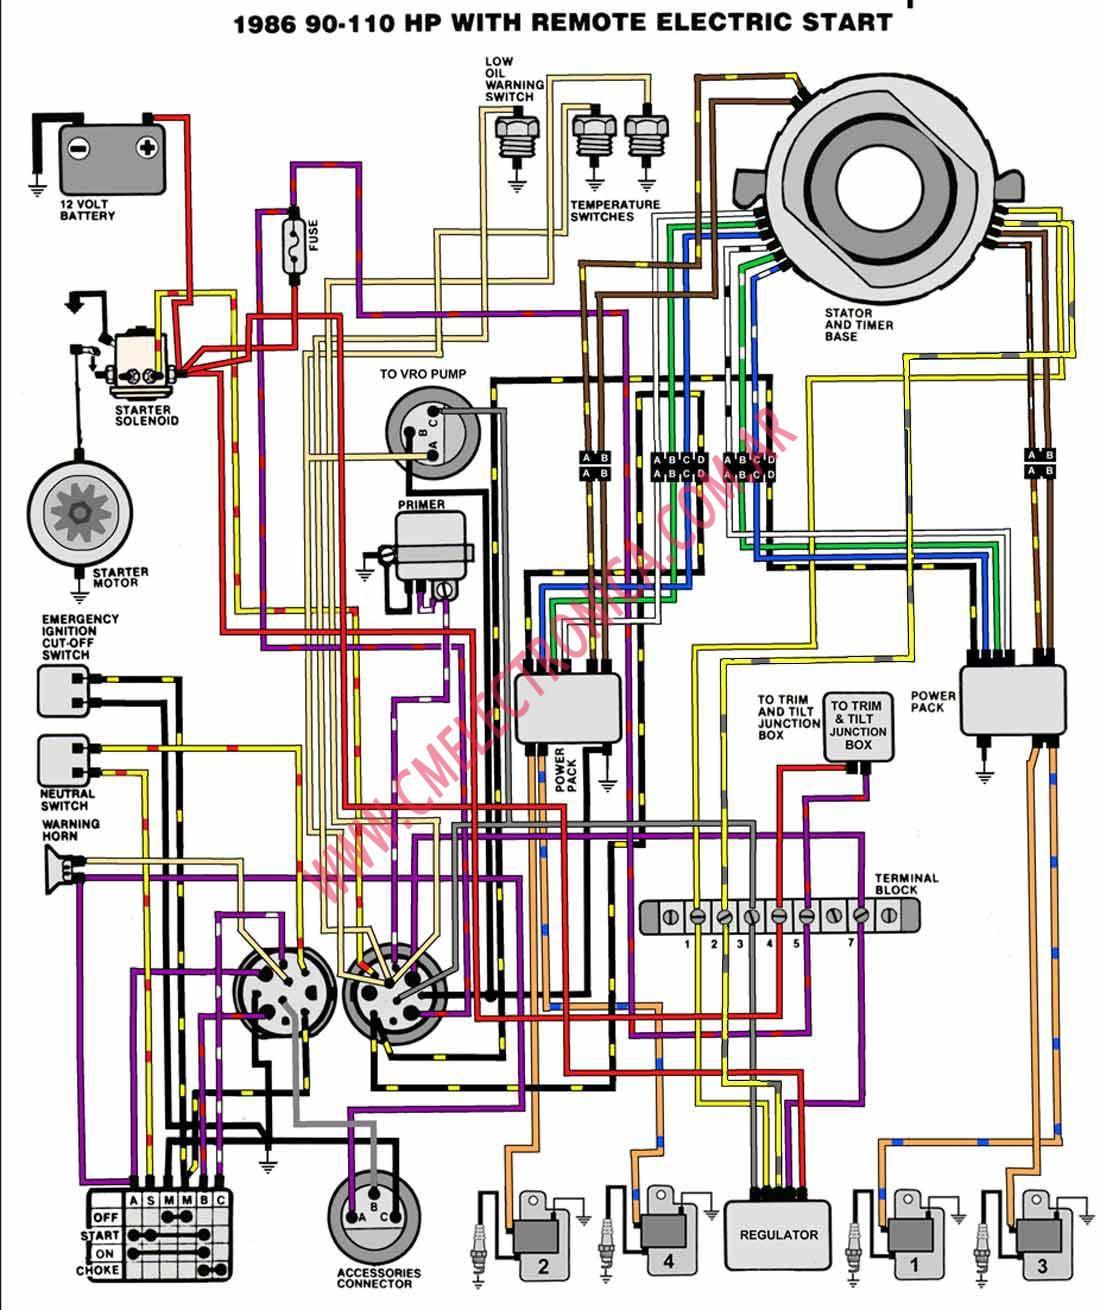 Kymco Super 8 Wiring Diagram Motorrad Bild Idee Cannondale Atv Schematic